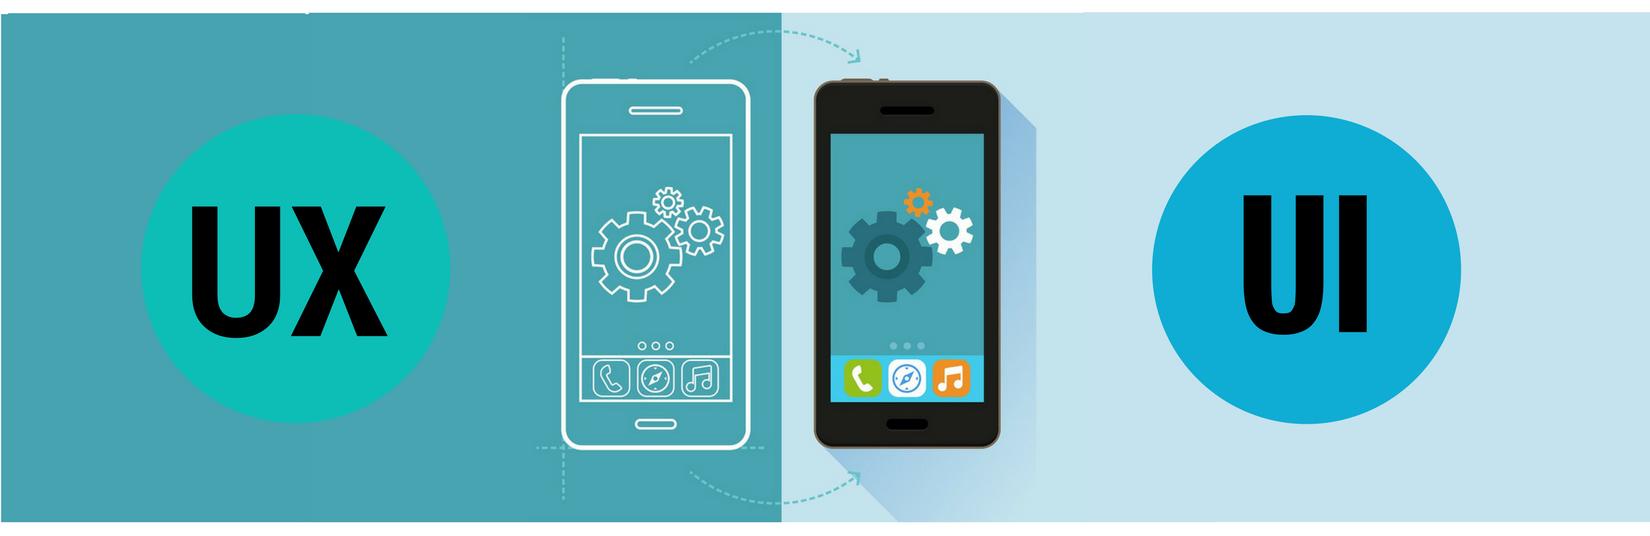 Ux design principles for mobile apps home design ideas for Design your home app